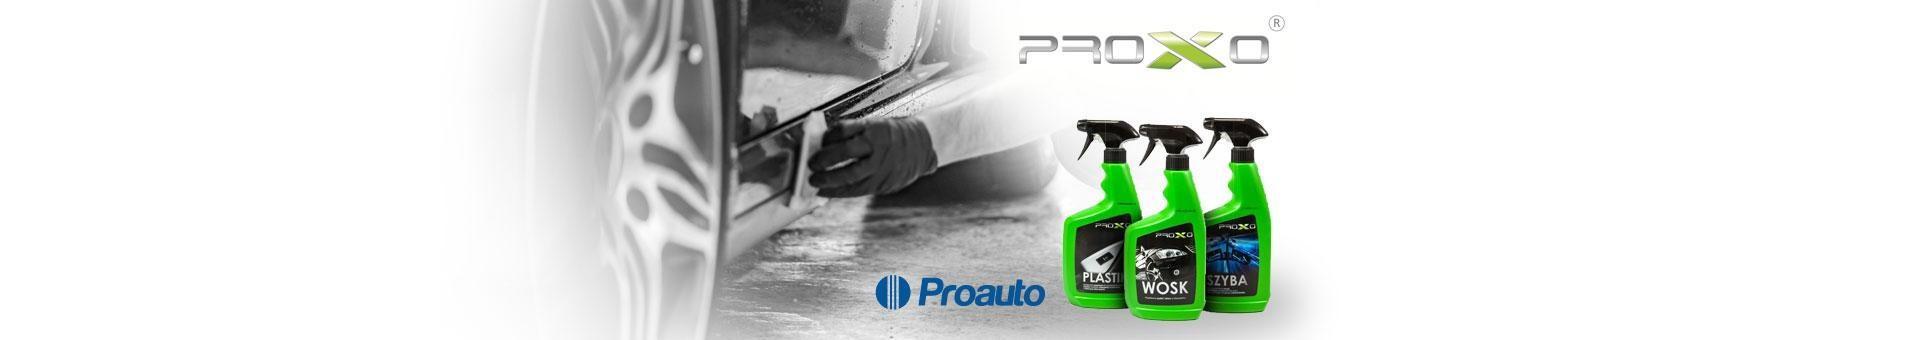 slidery proxo - Proauto